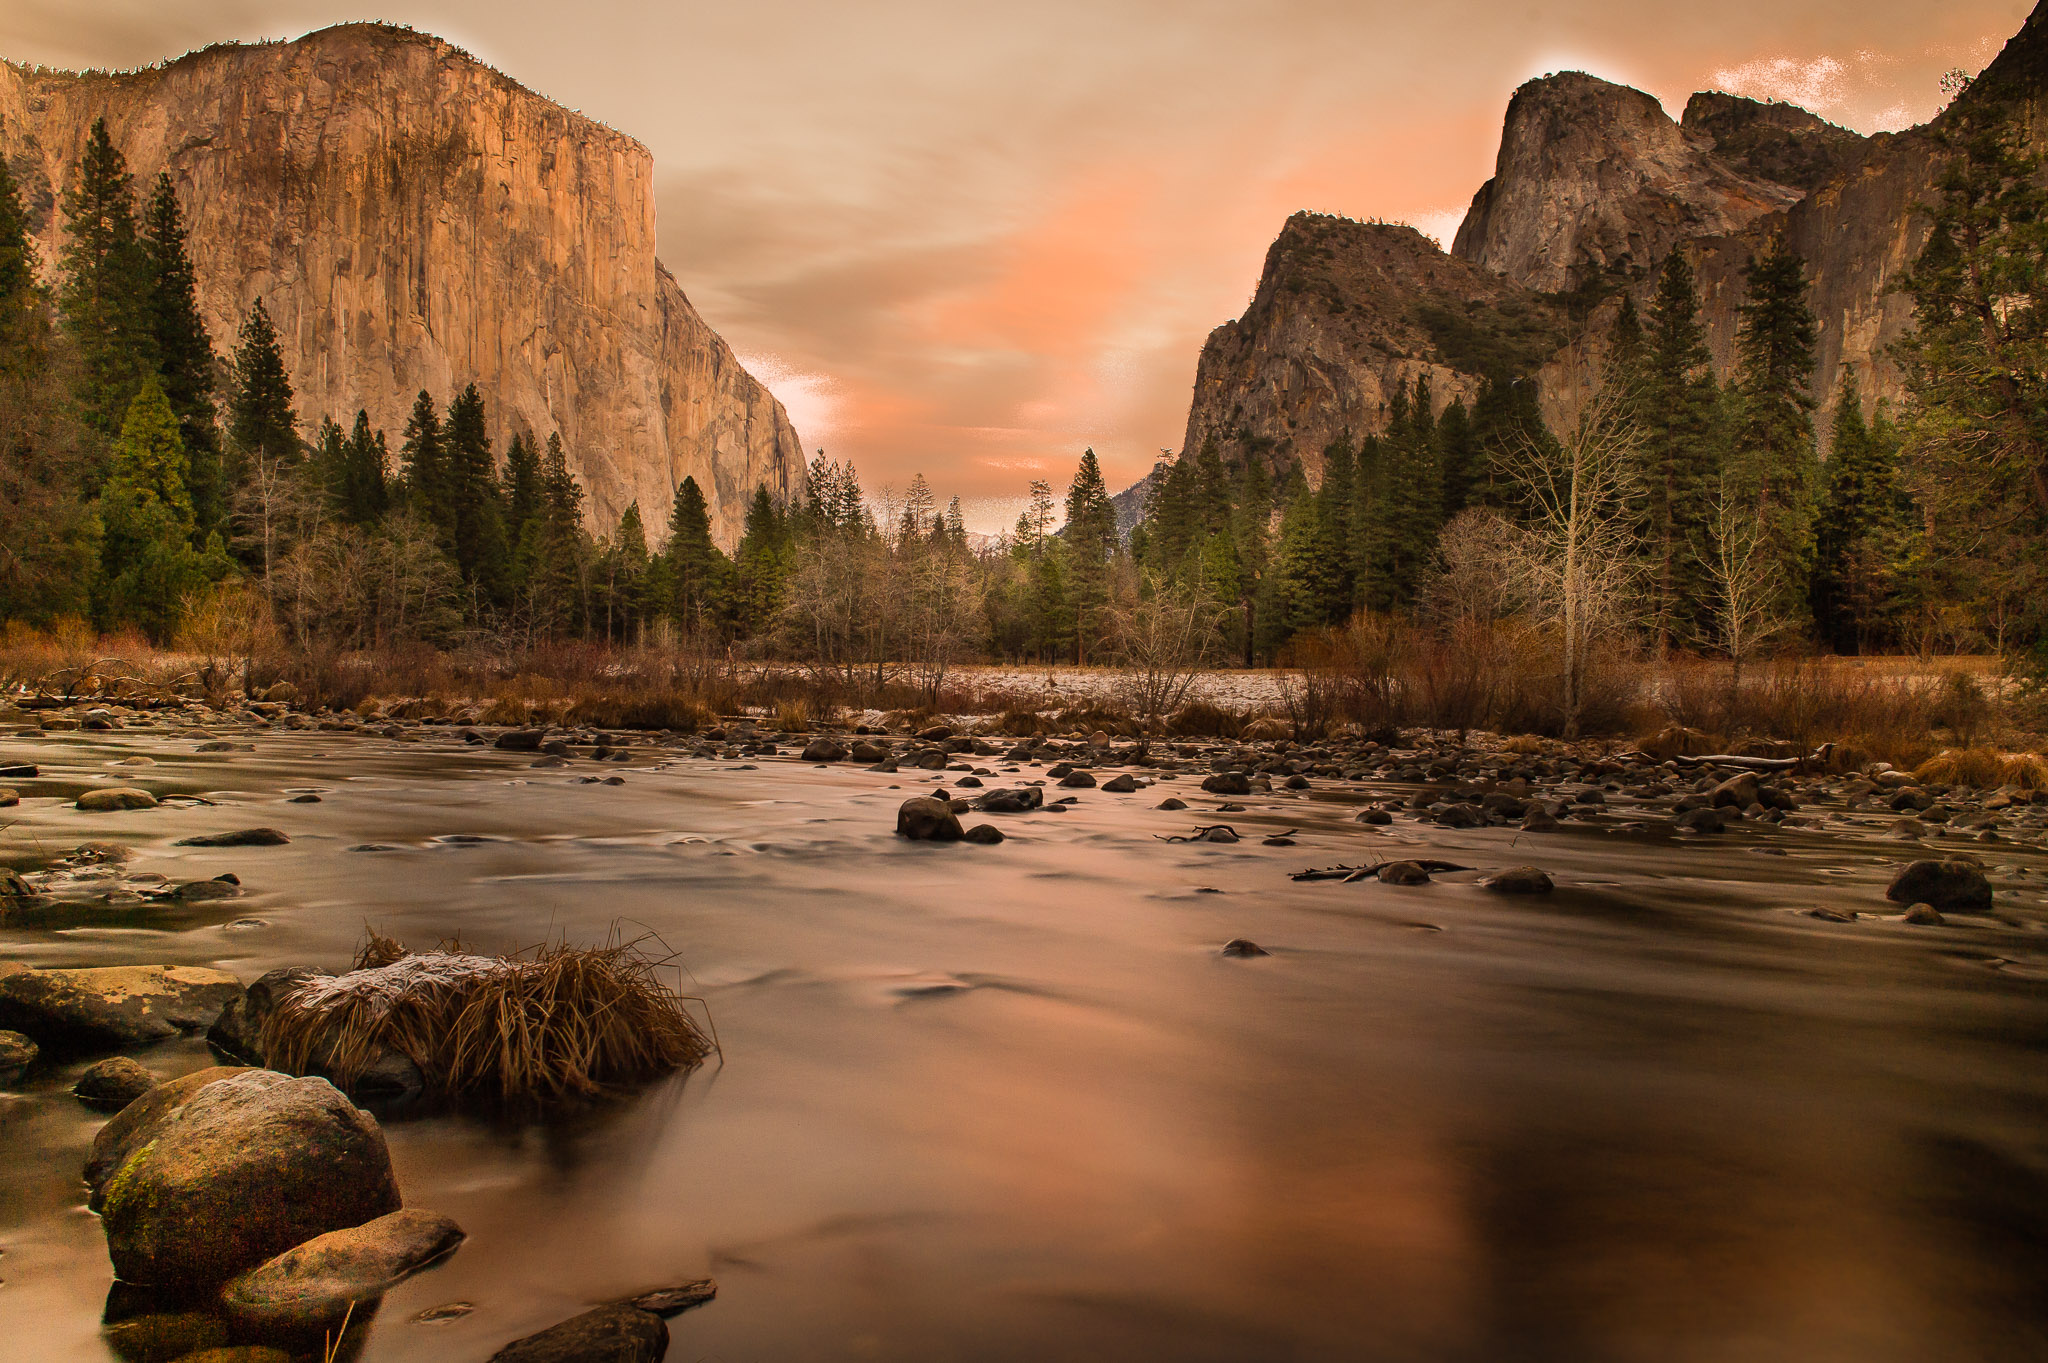 Jason-Davis-Images-Yosemite-0001.jpg